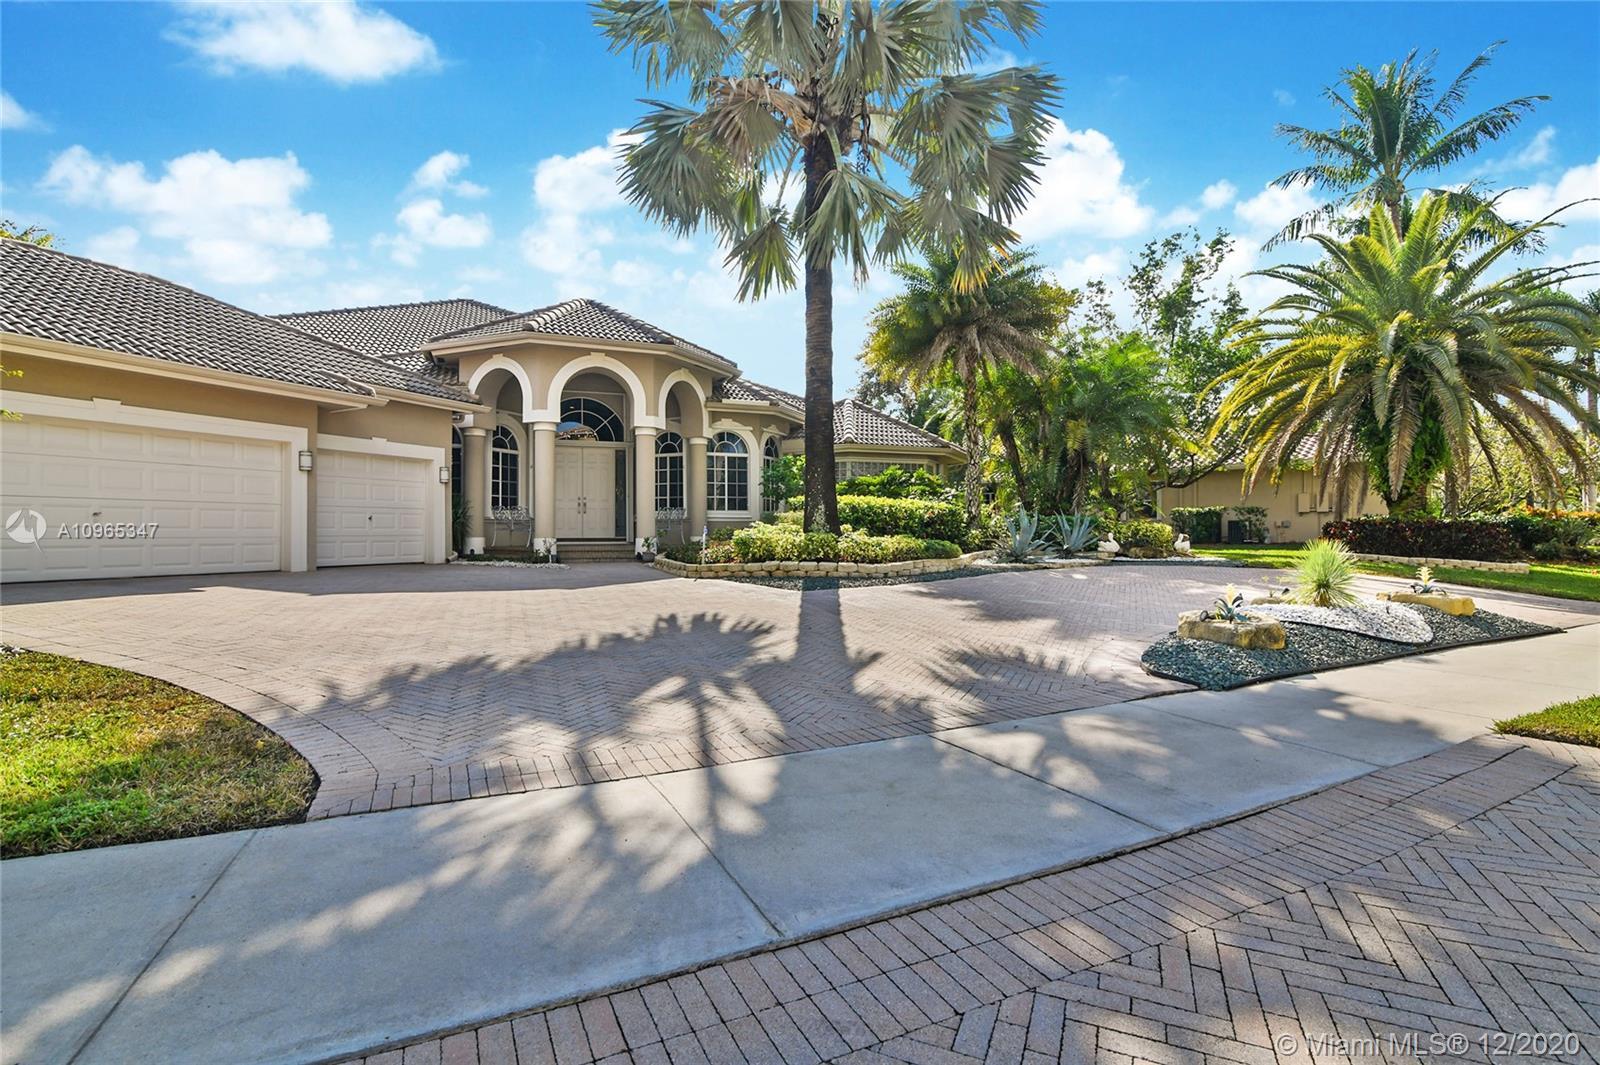 Weston Hills - 2488 Provence Cir, Weston, FL 33327